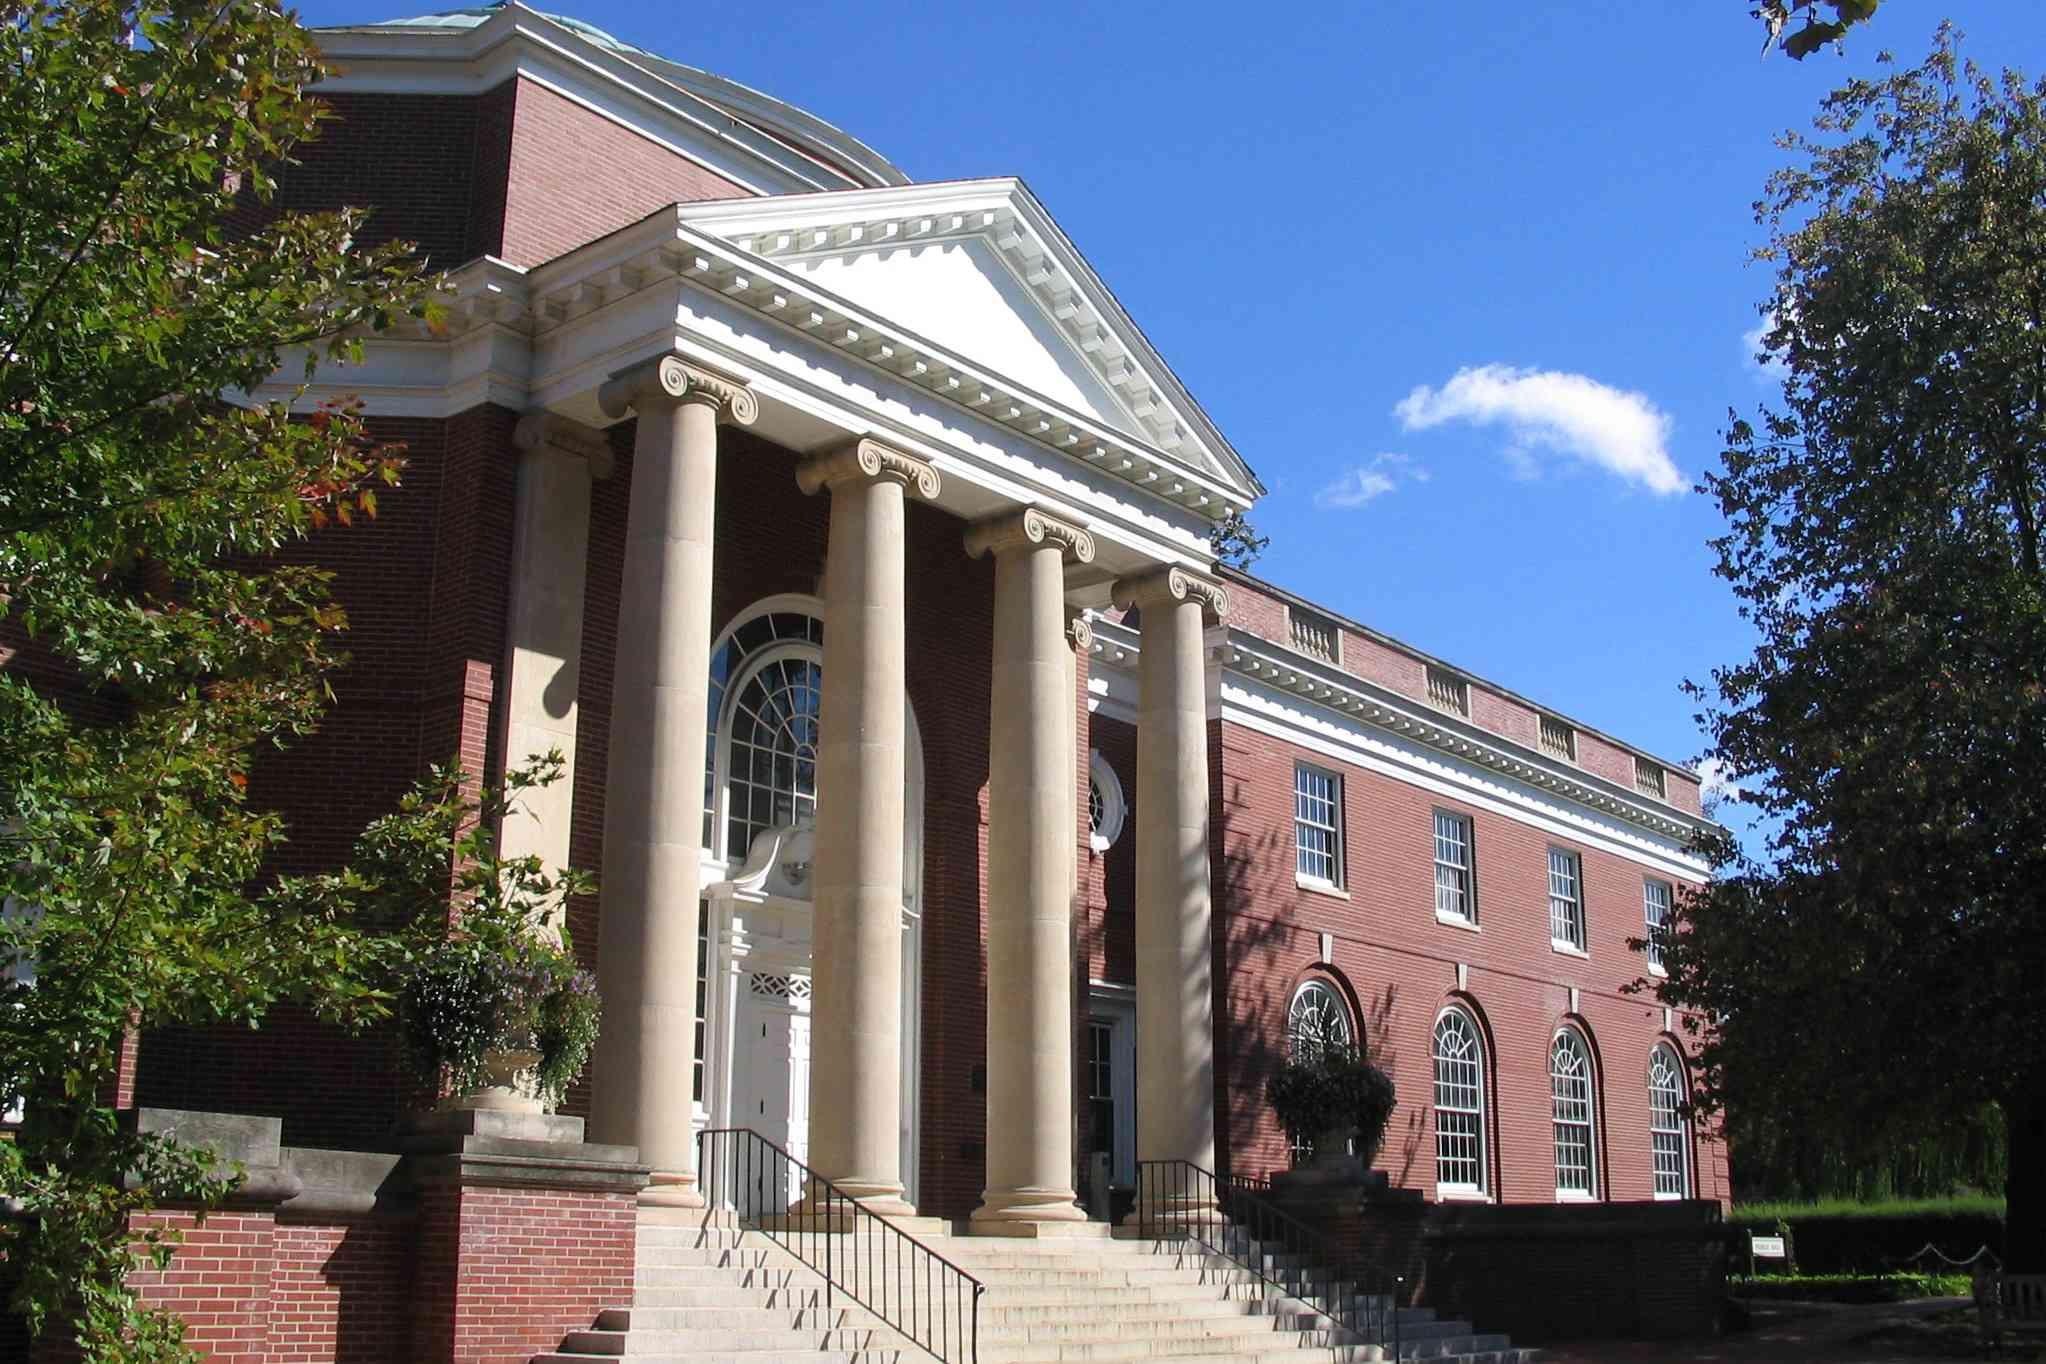 Trinkle Hall at the University of Mary Washington